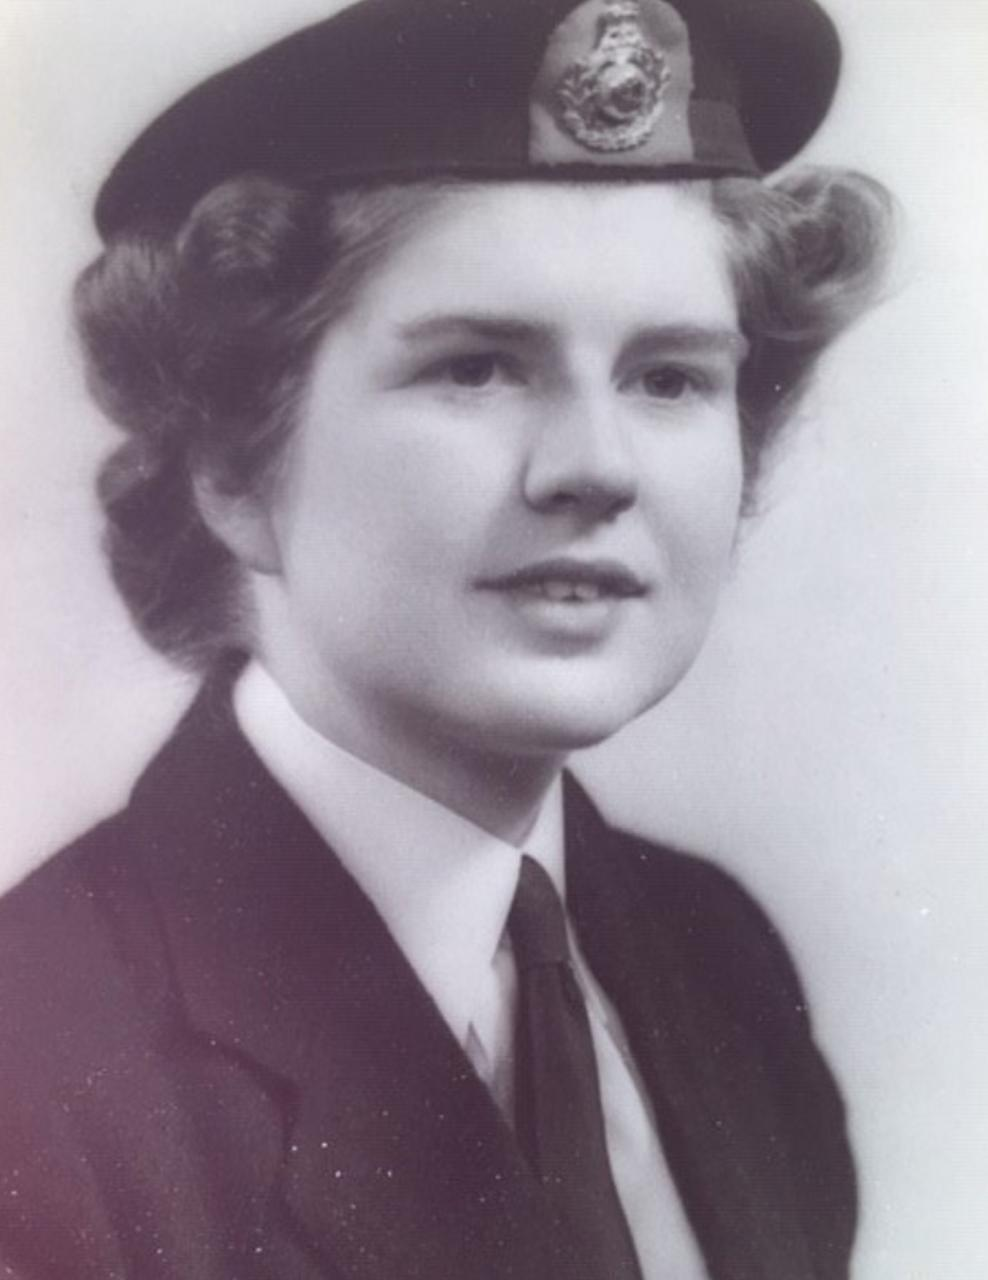 Peggy as a WREN